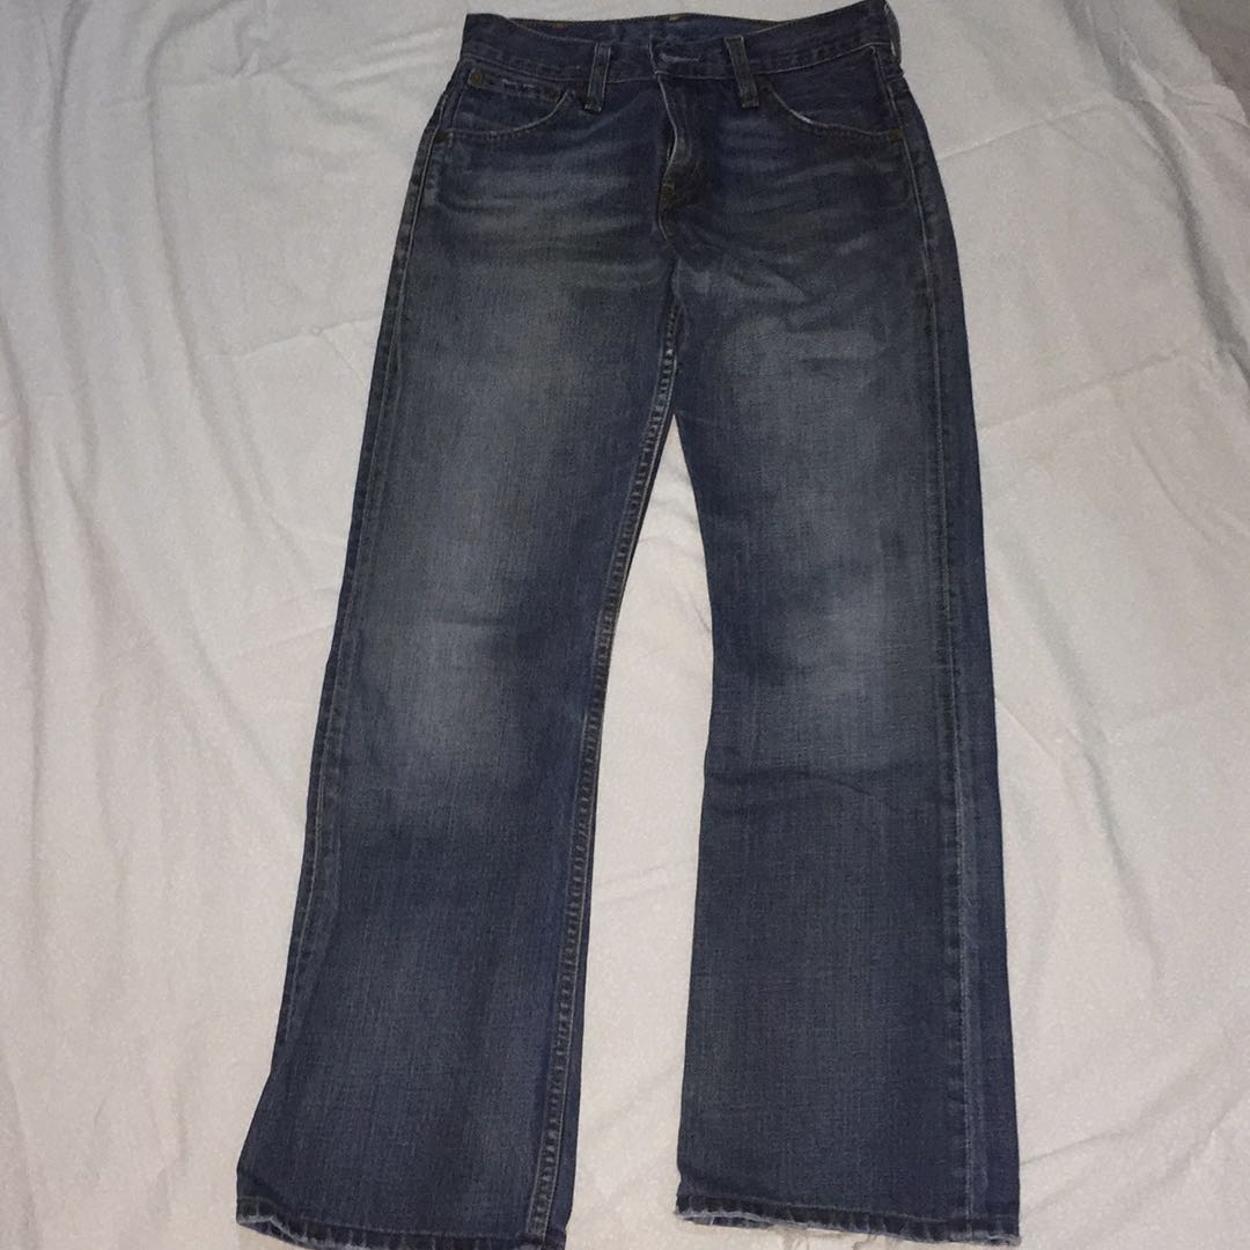 Levi's Jean